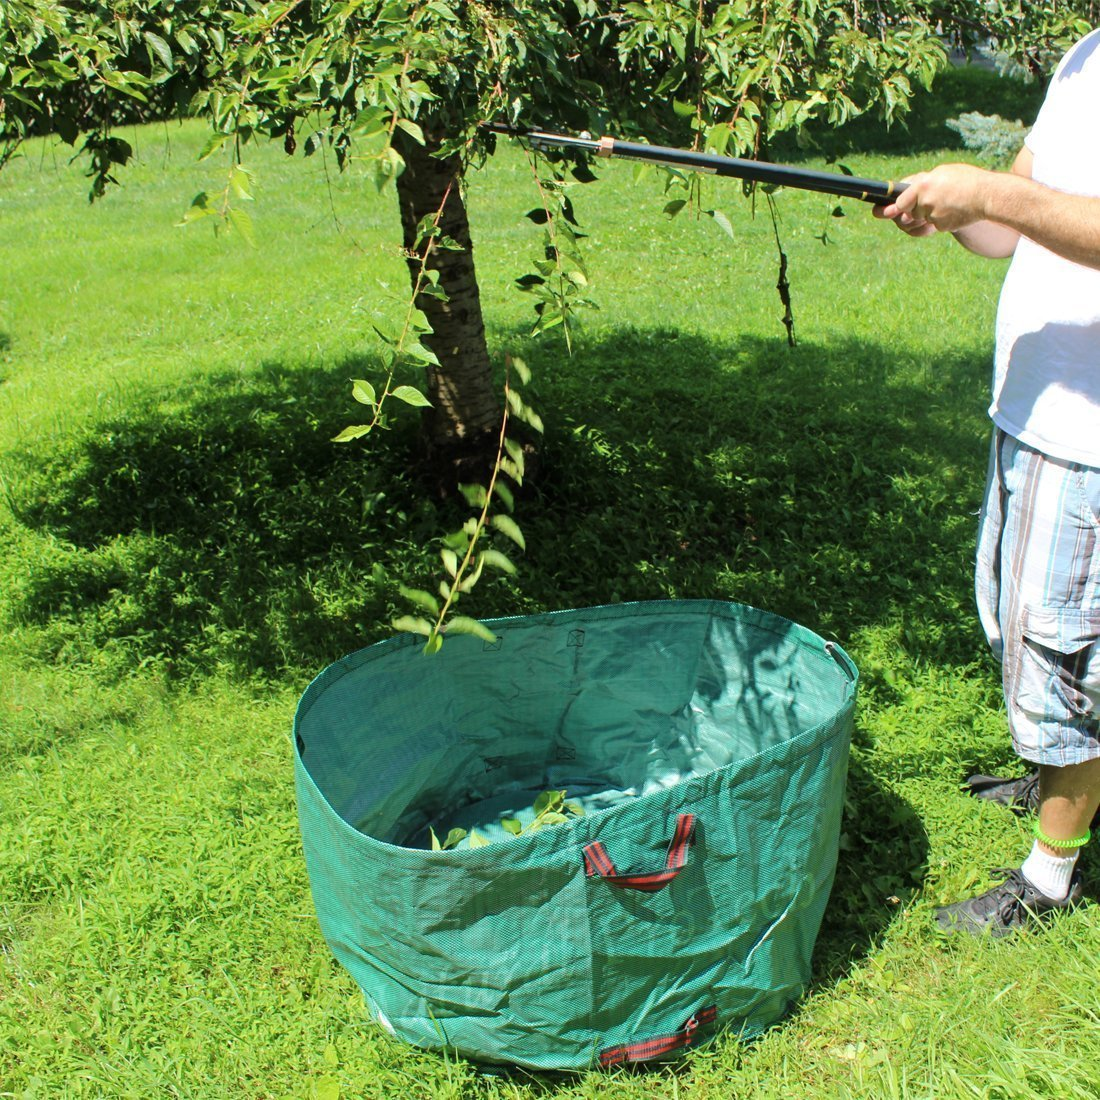 SUNWIN Lawn and Leaf Bags Garden Reusable Leaf Bag Yard Lawn Gardening Waste Bag 63 Gallons